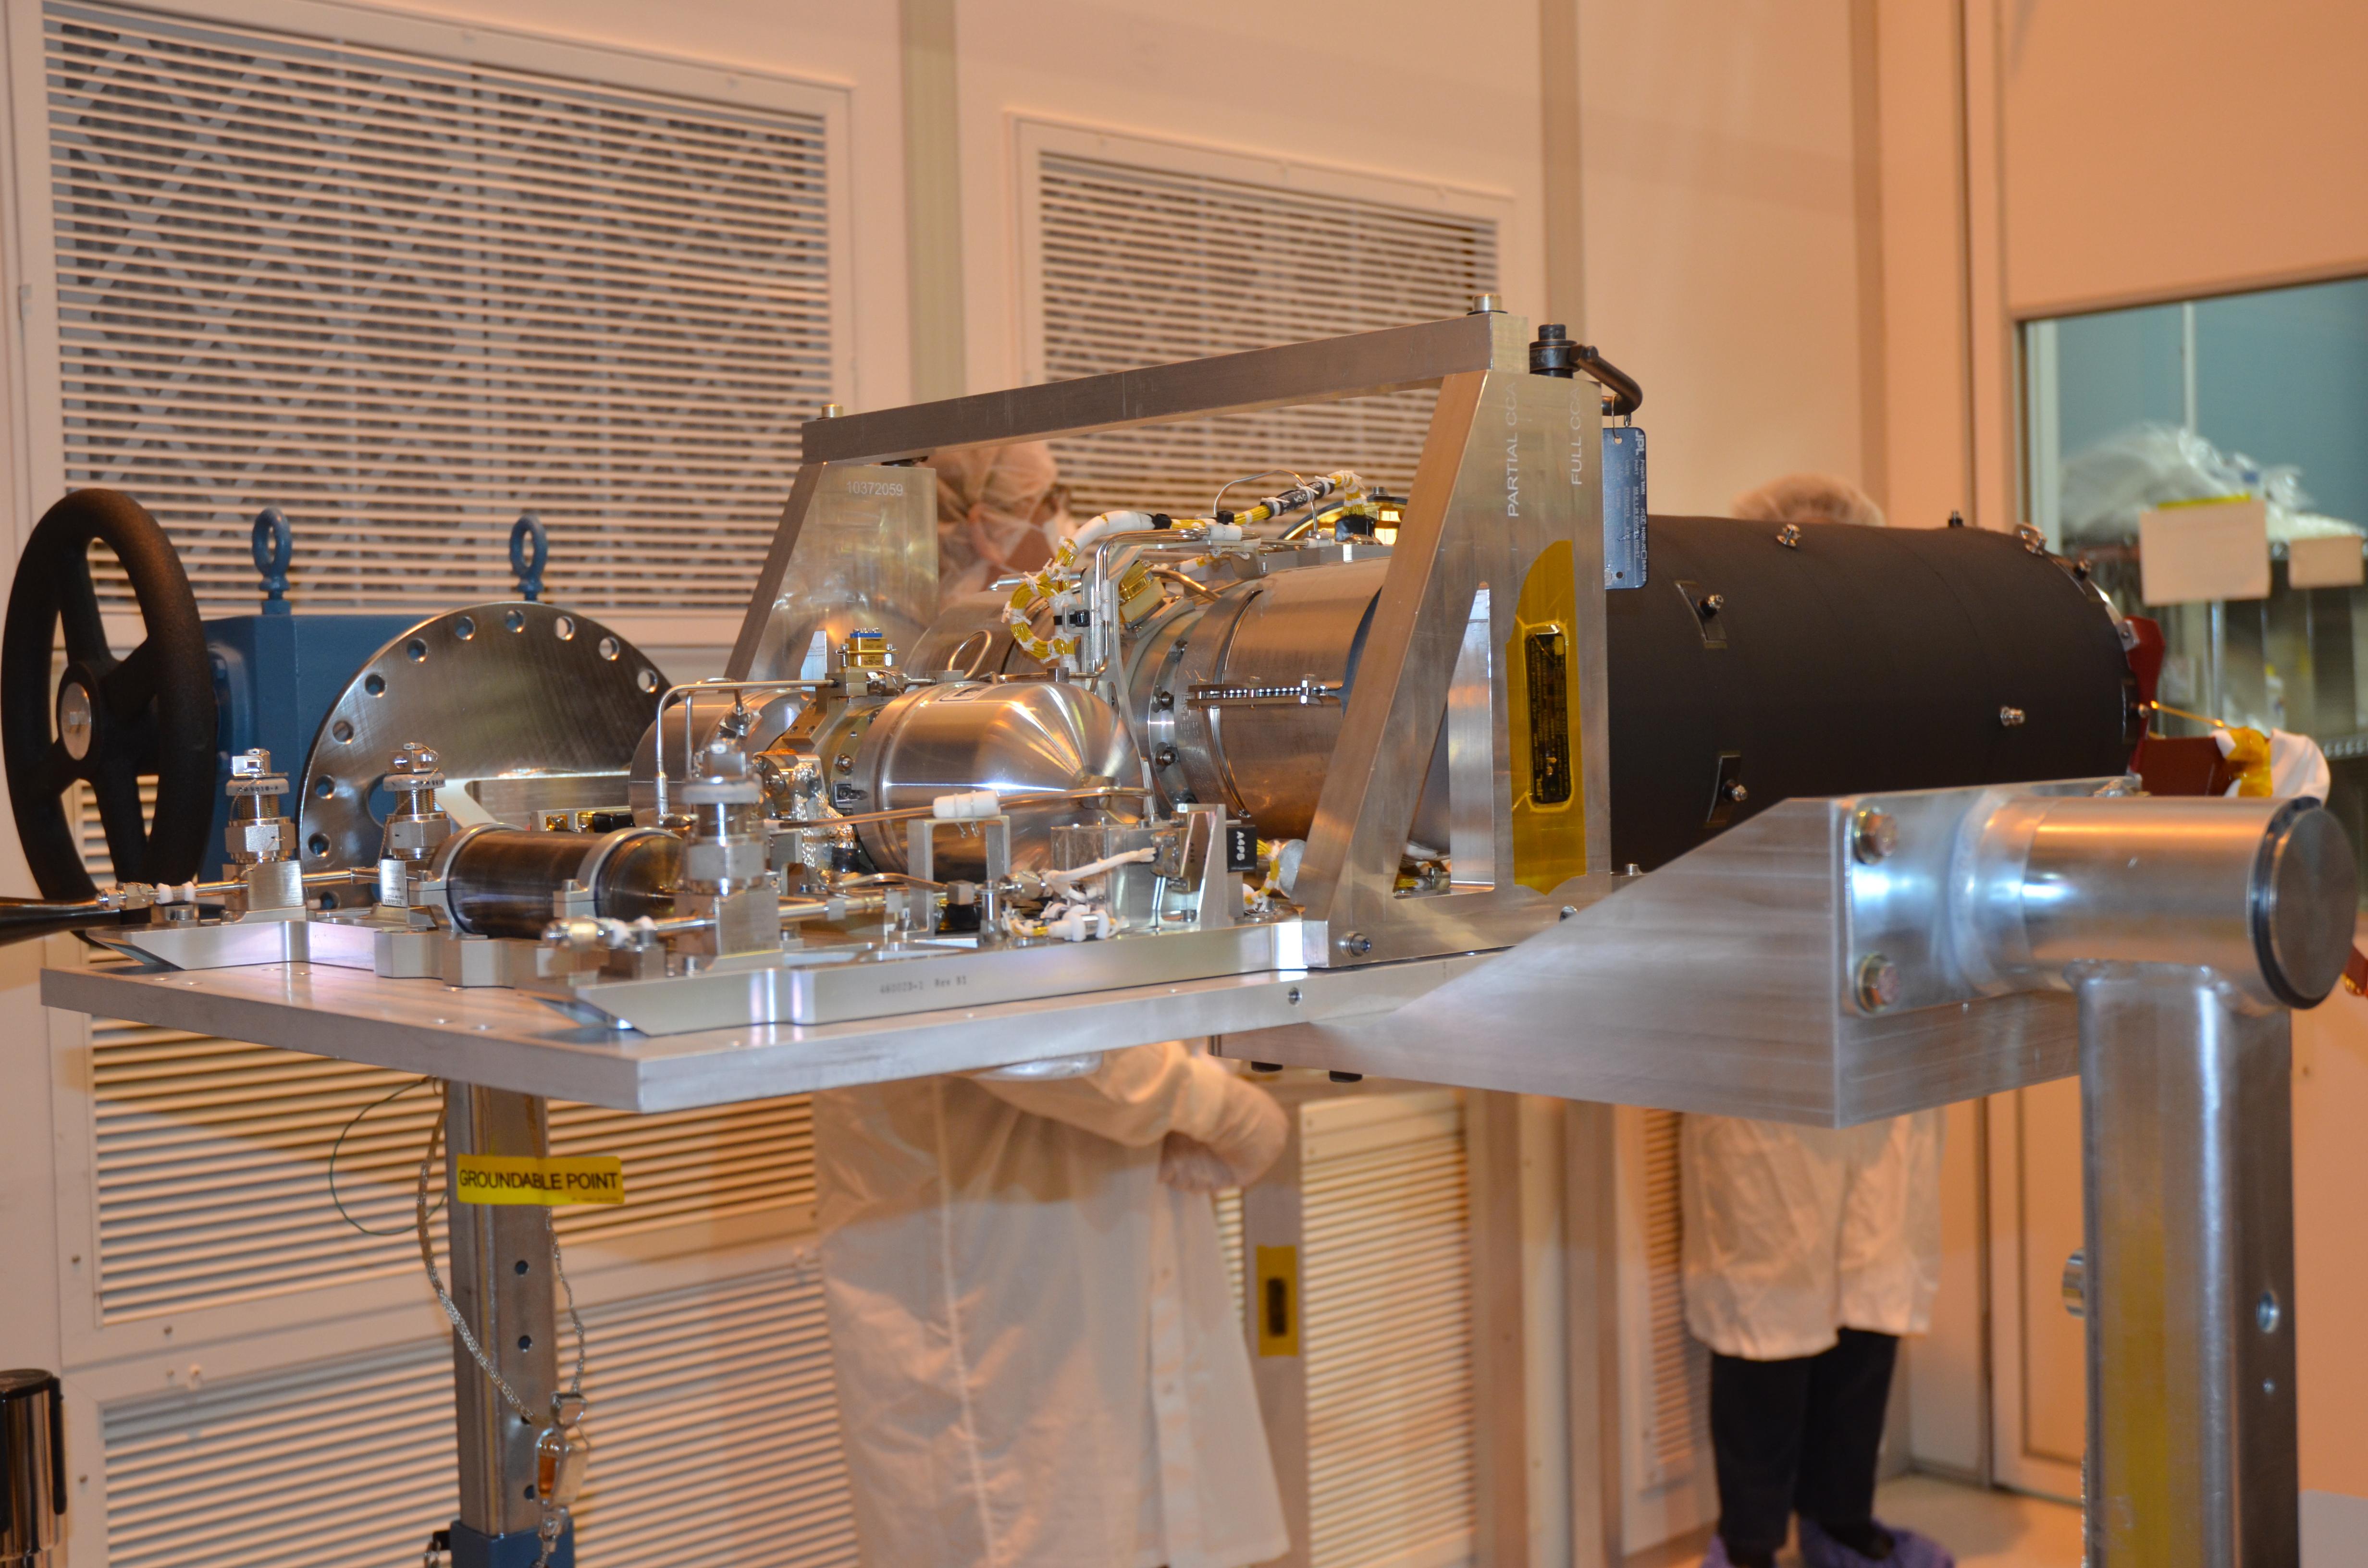 Goto vs manual telescopes which should i choose u celestial viewing